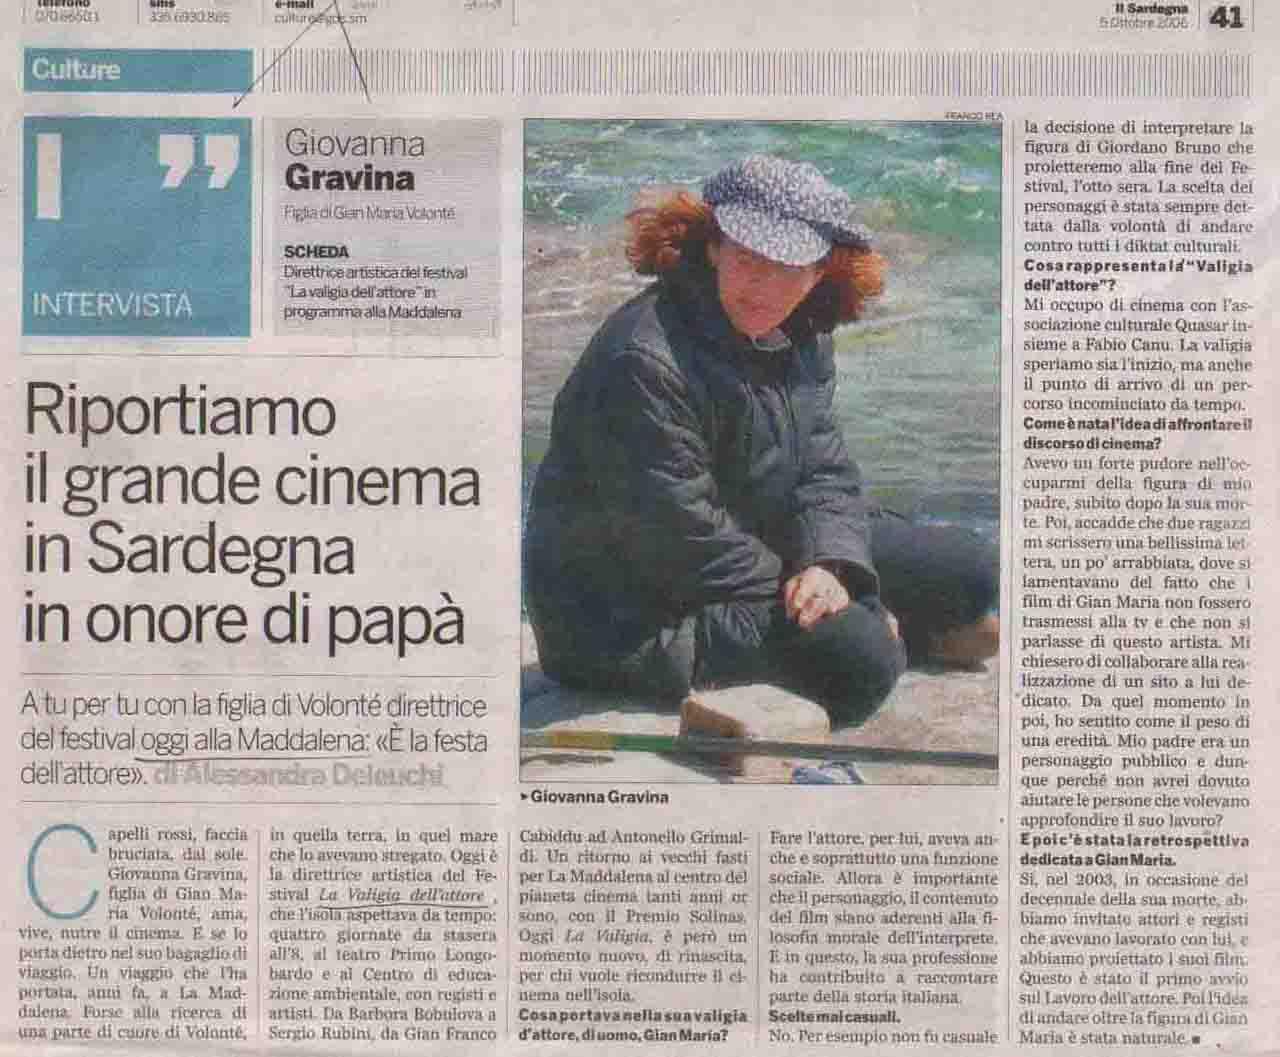 Il Sardegna (culture) 5 ott 2006